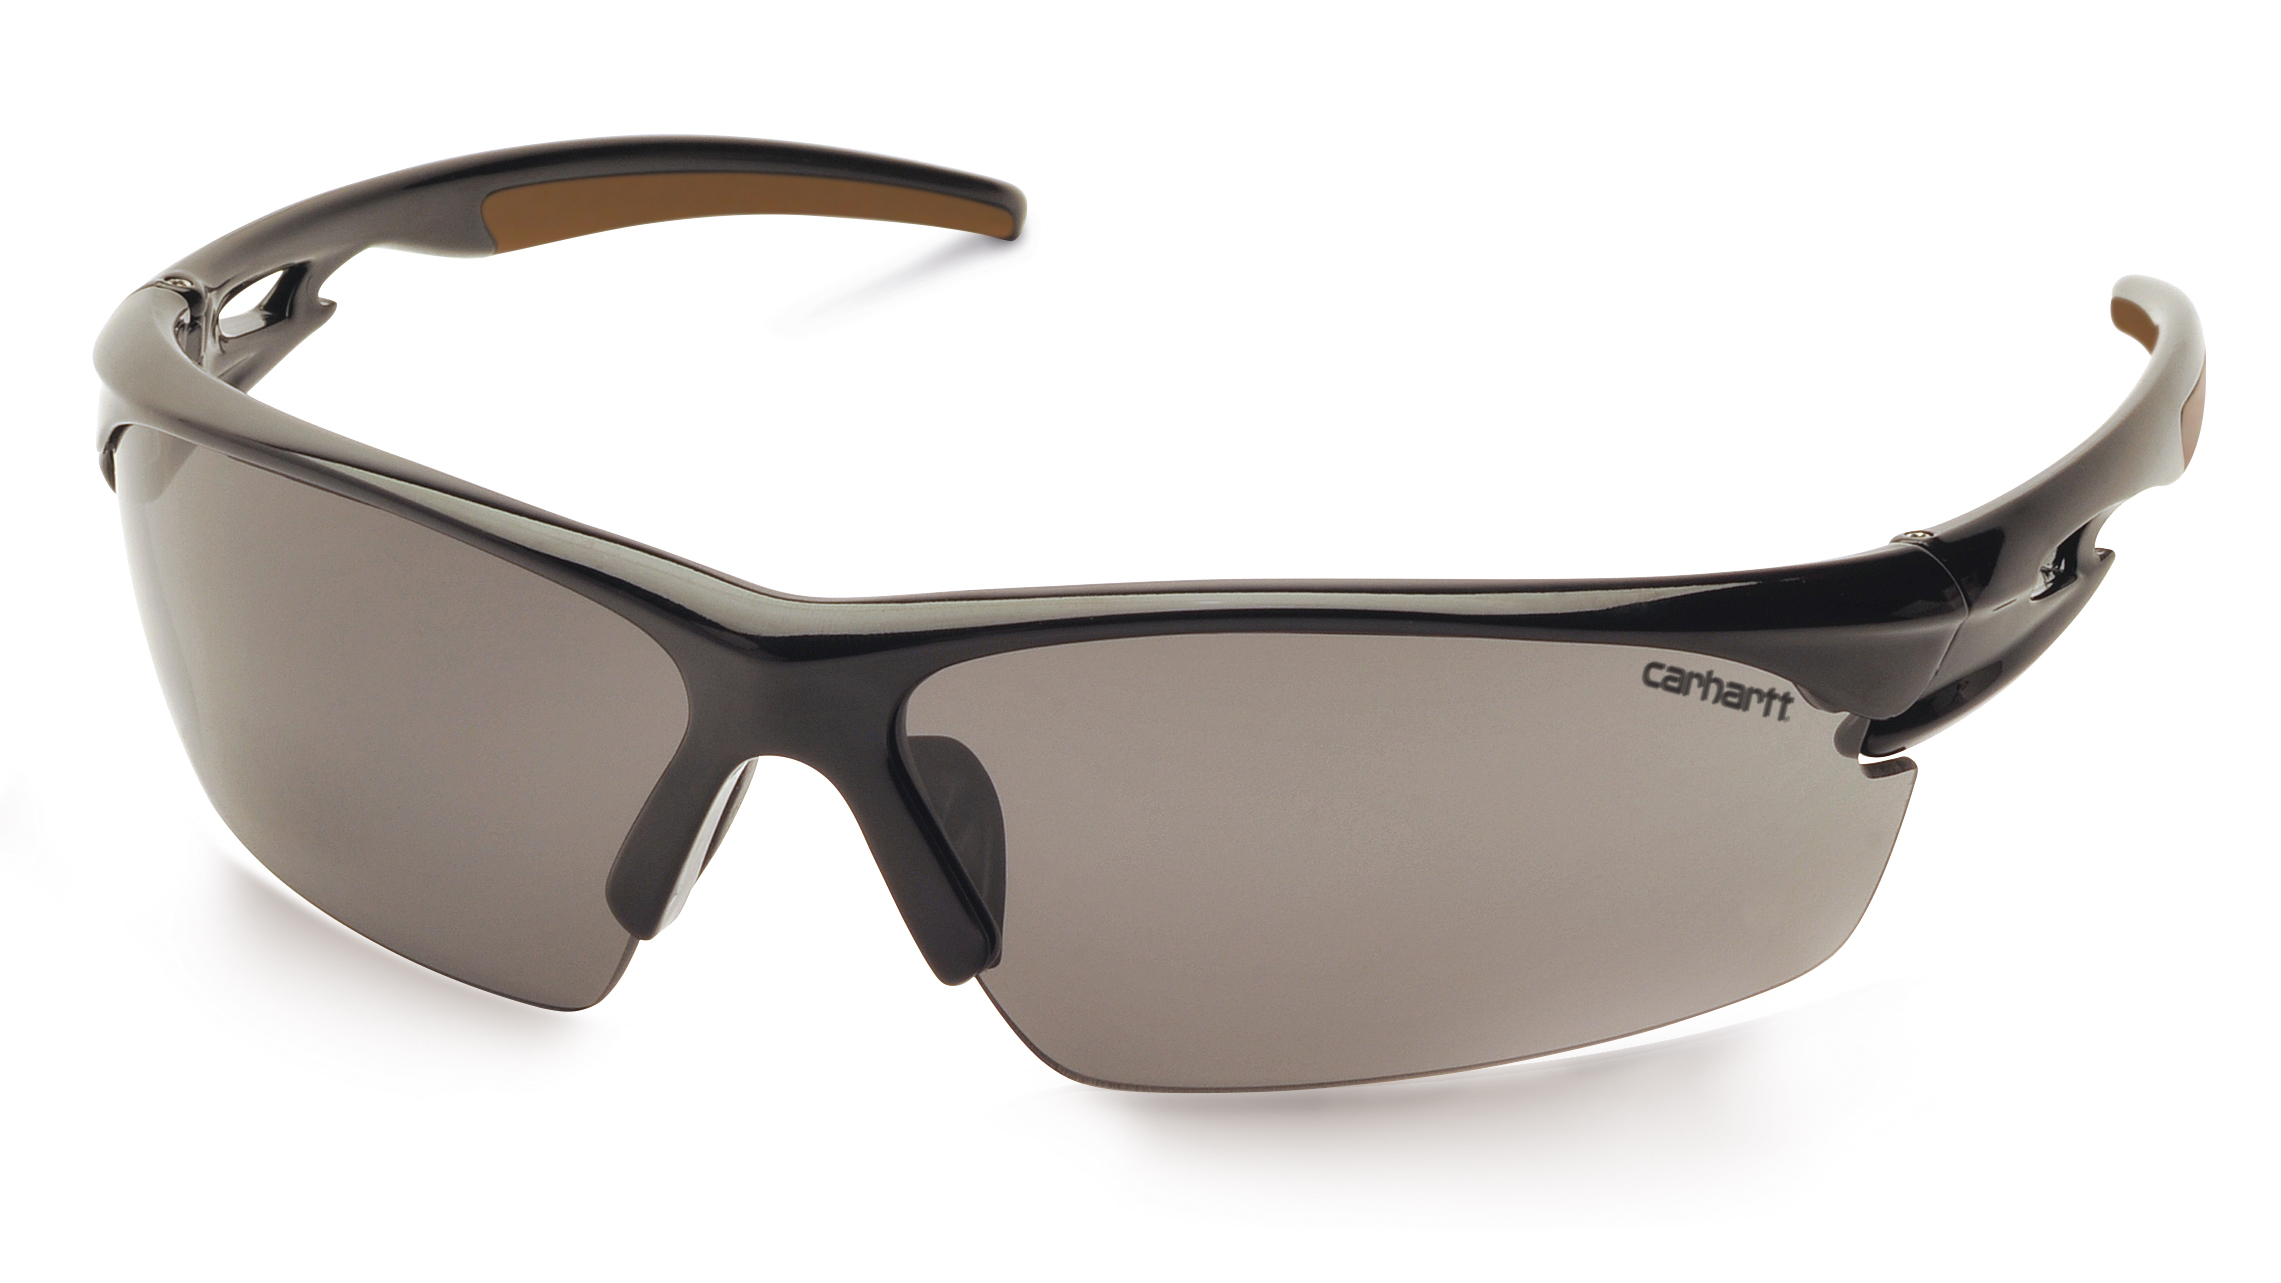 Carhartt Schutzbrille Ironside + , Grau, ANSI Z87.1